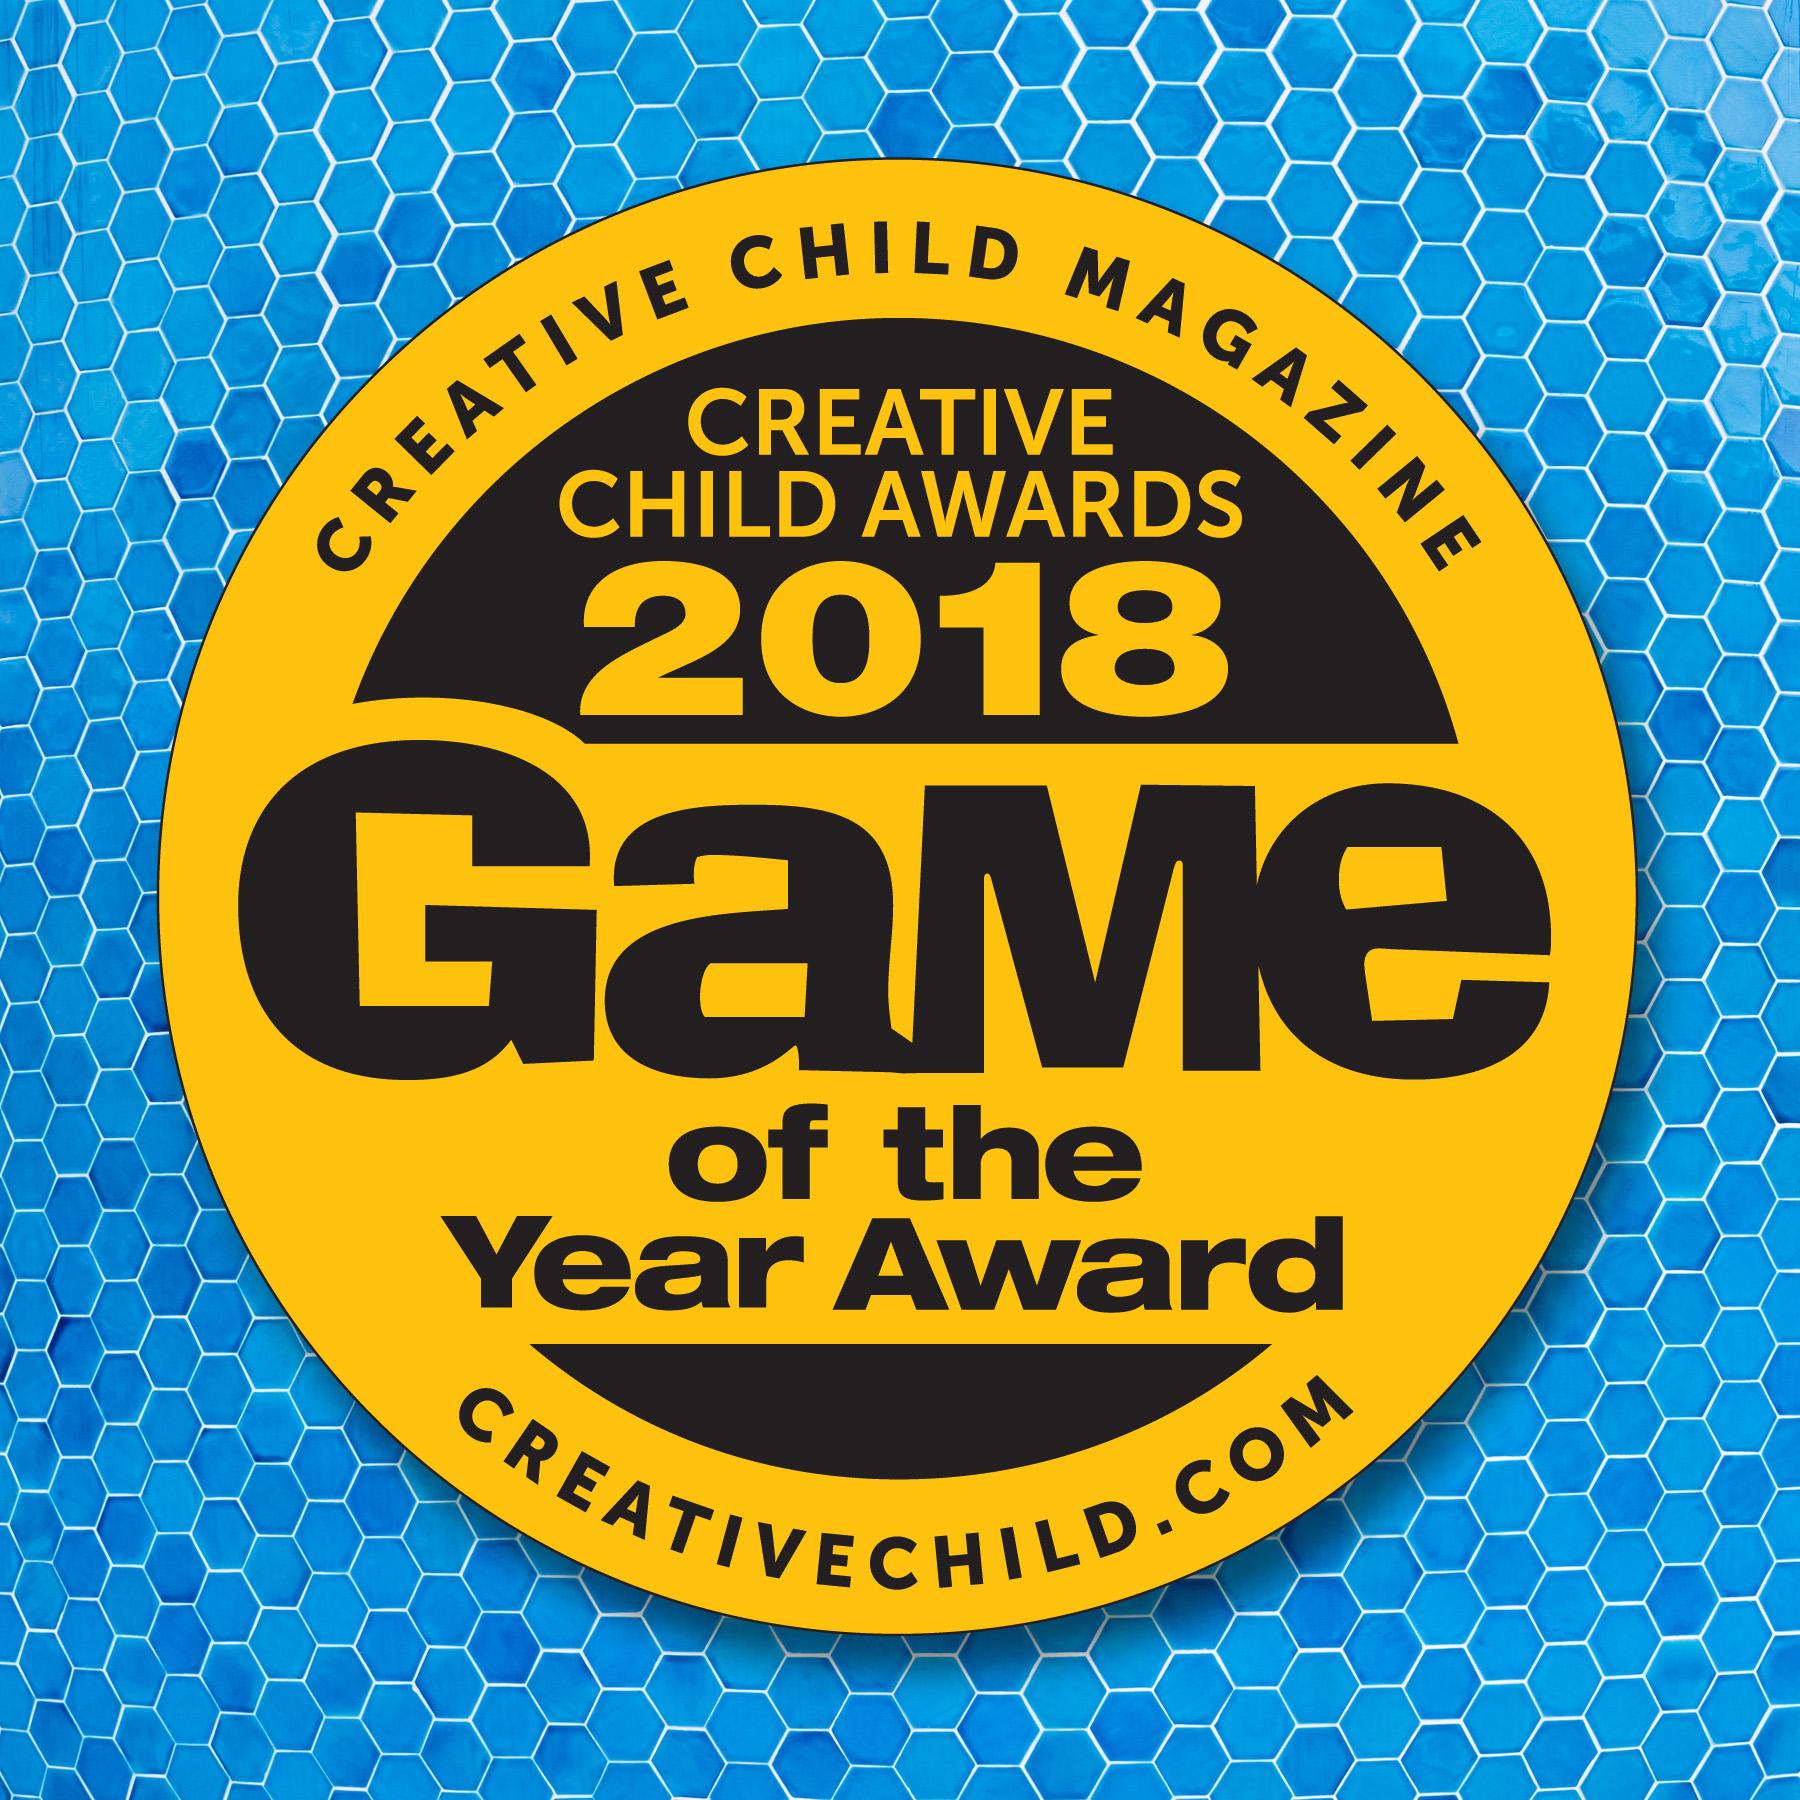 Candygrams-Family-Board-Games-Word-Game-Award-Winning-Gift-Creative-Child-Unsplash.jpg